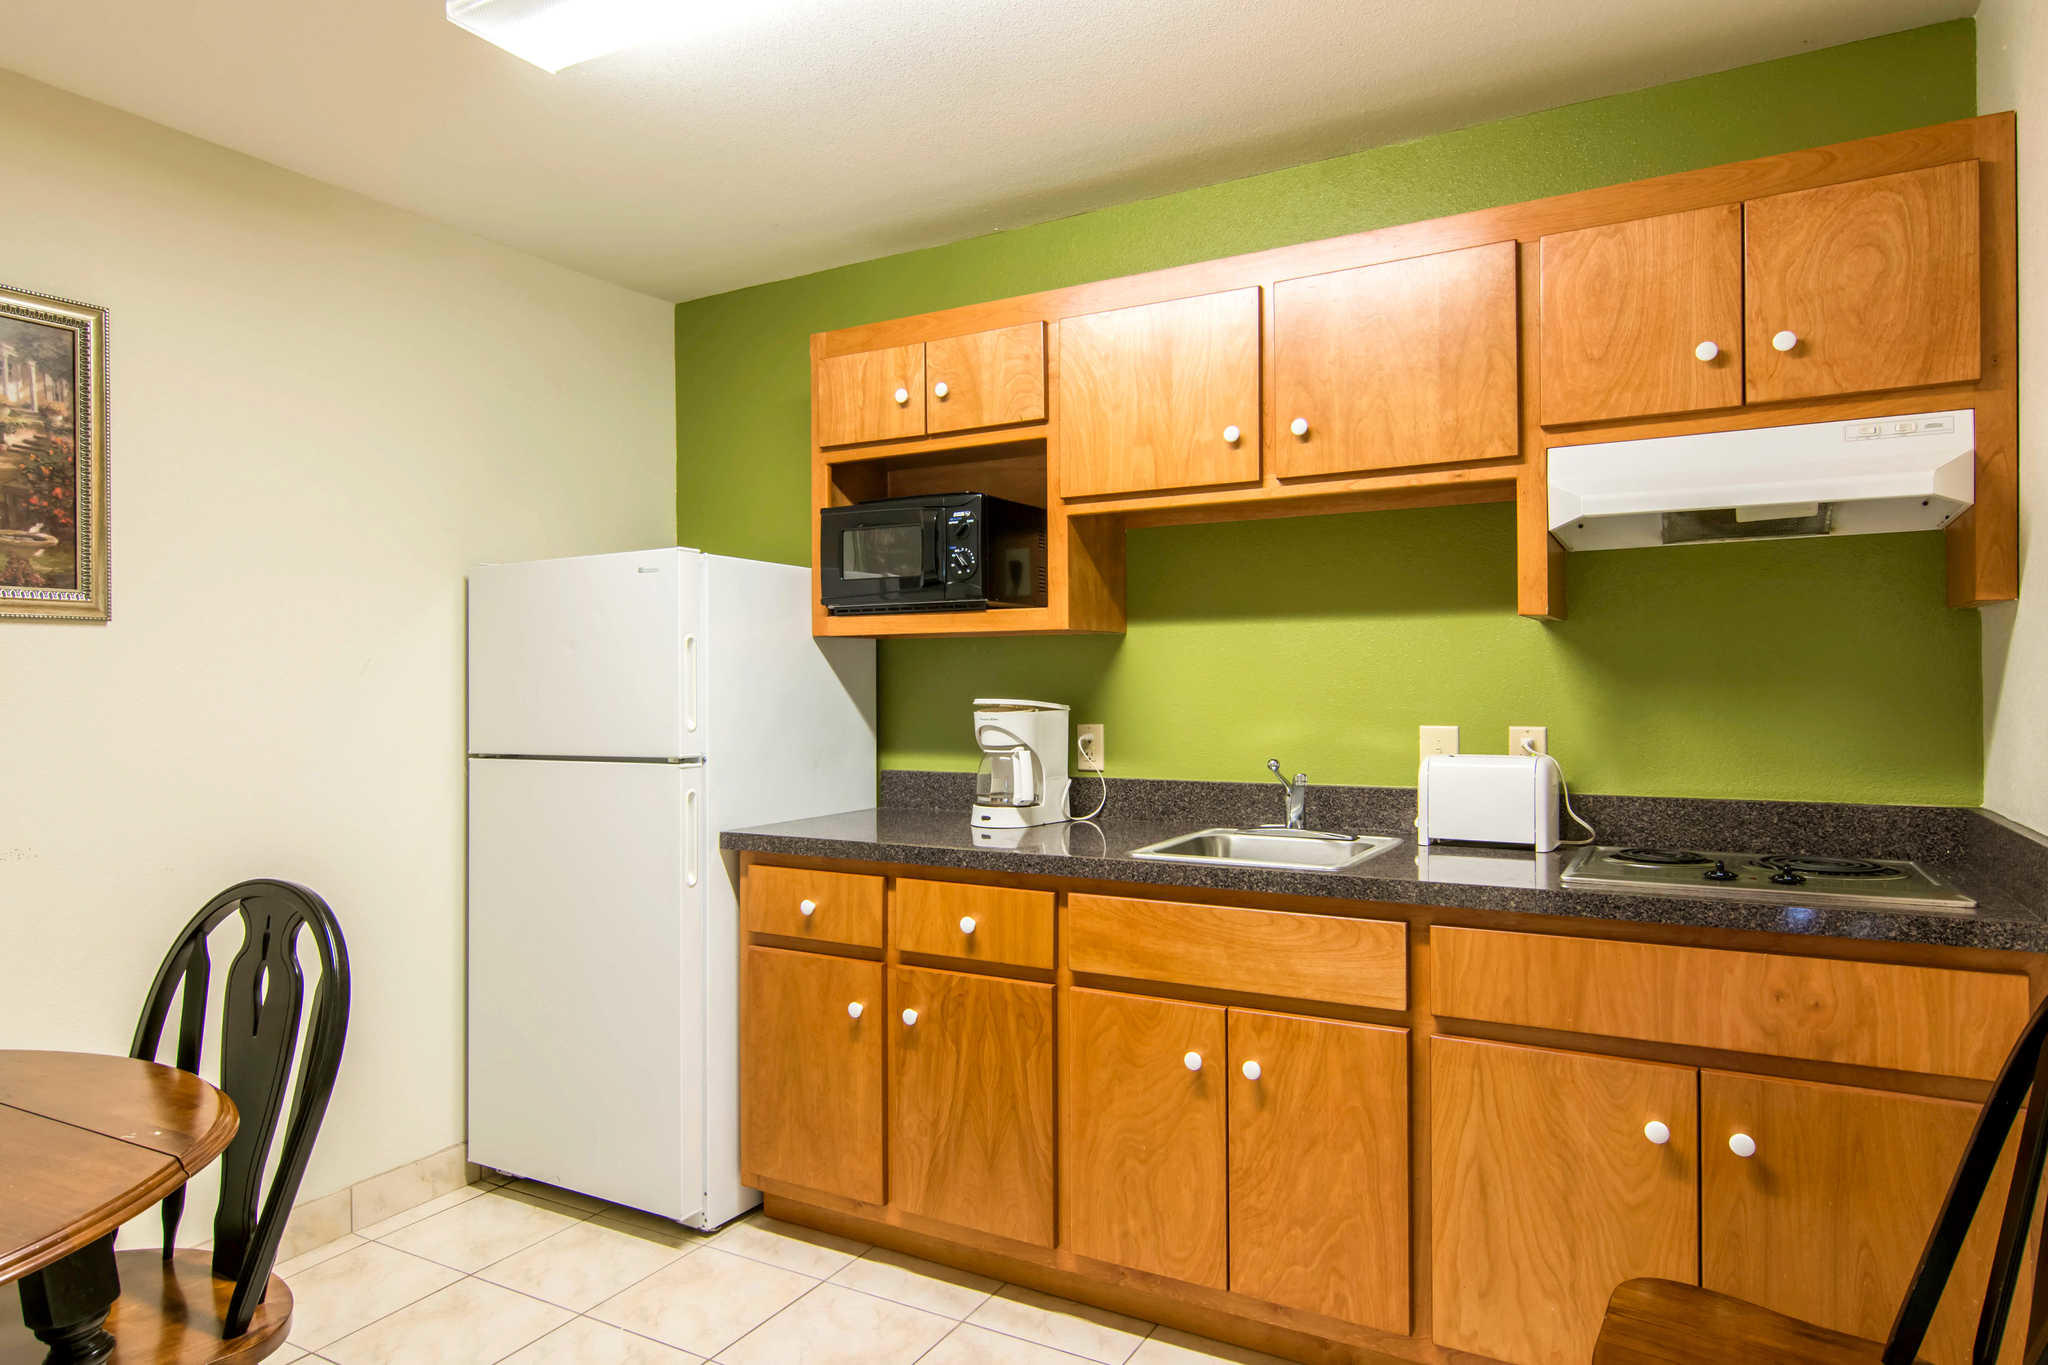 Sleep Inn & Suites At Fort Lee image 19